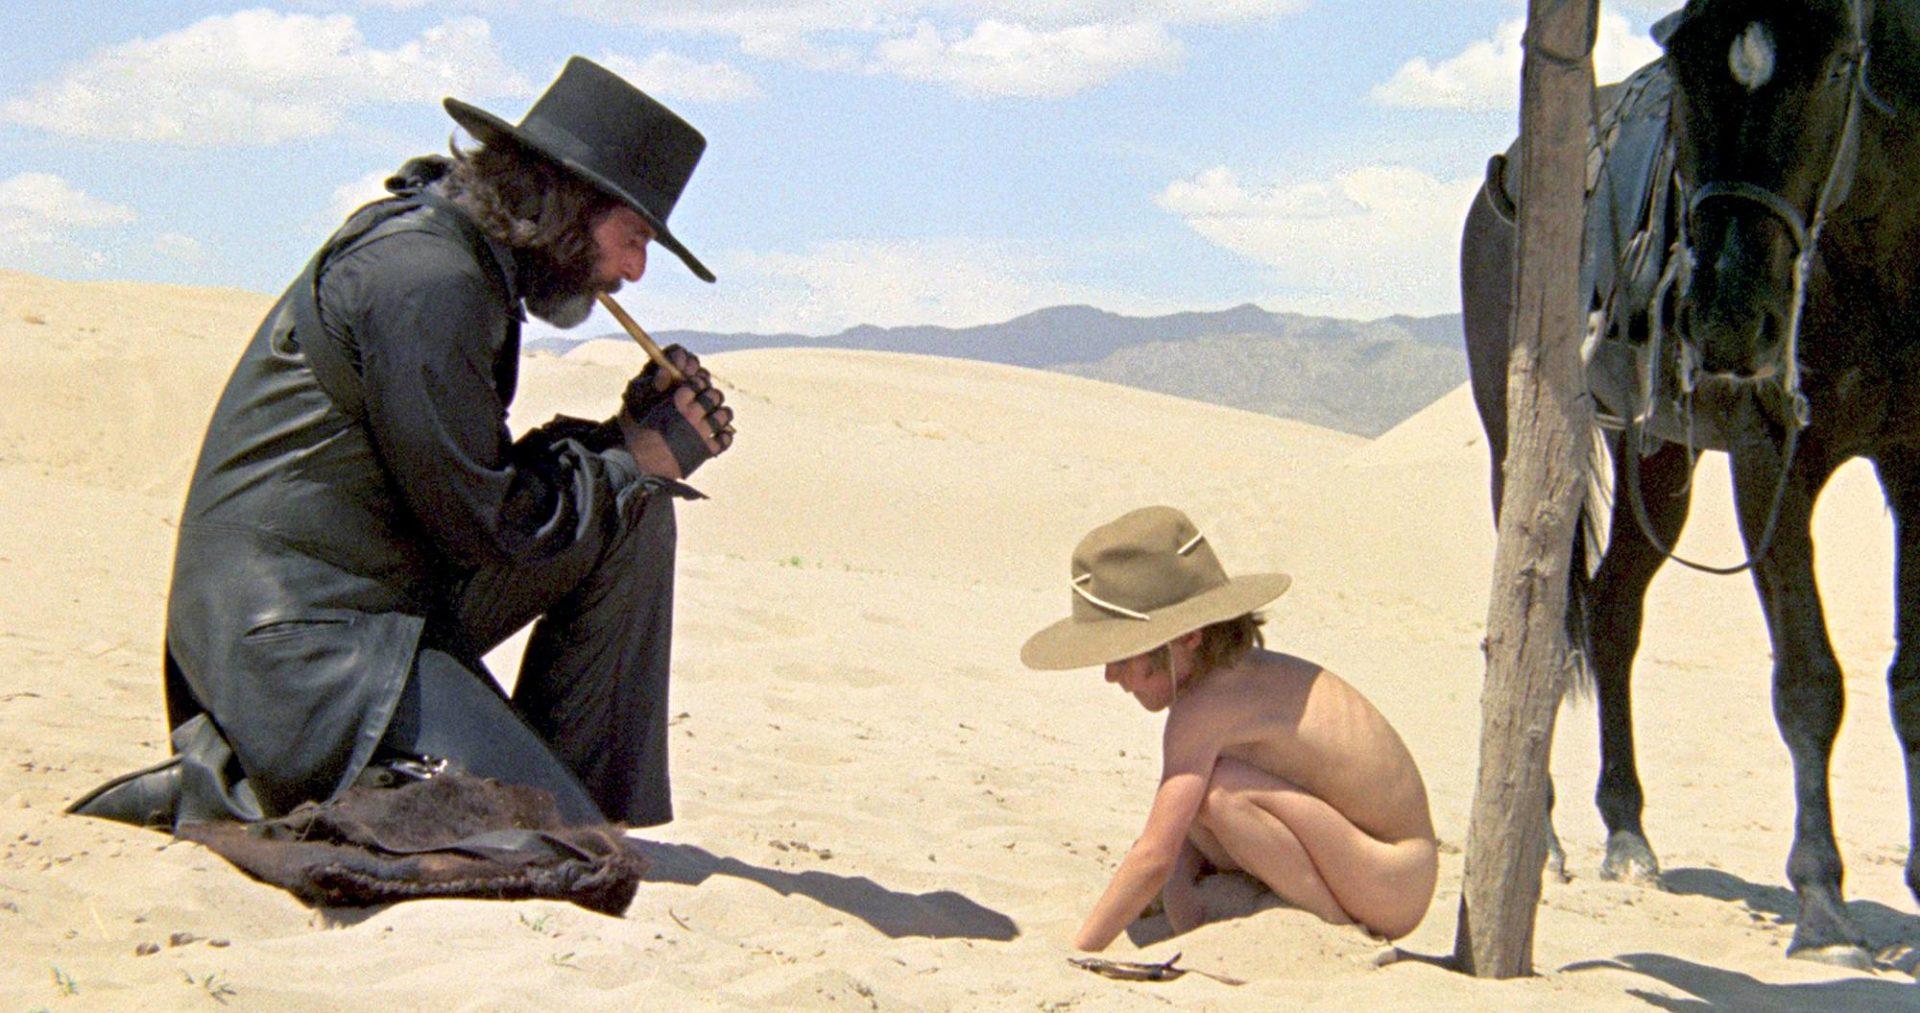 El Topossa Alejandro Jodorowsky näytteli nimiroolin. Pyssysankarin poikaa esitti oma poika Brontis Jodorowsky.